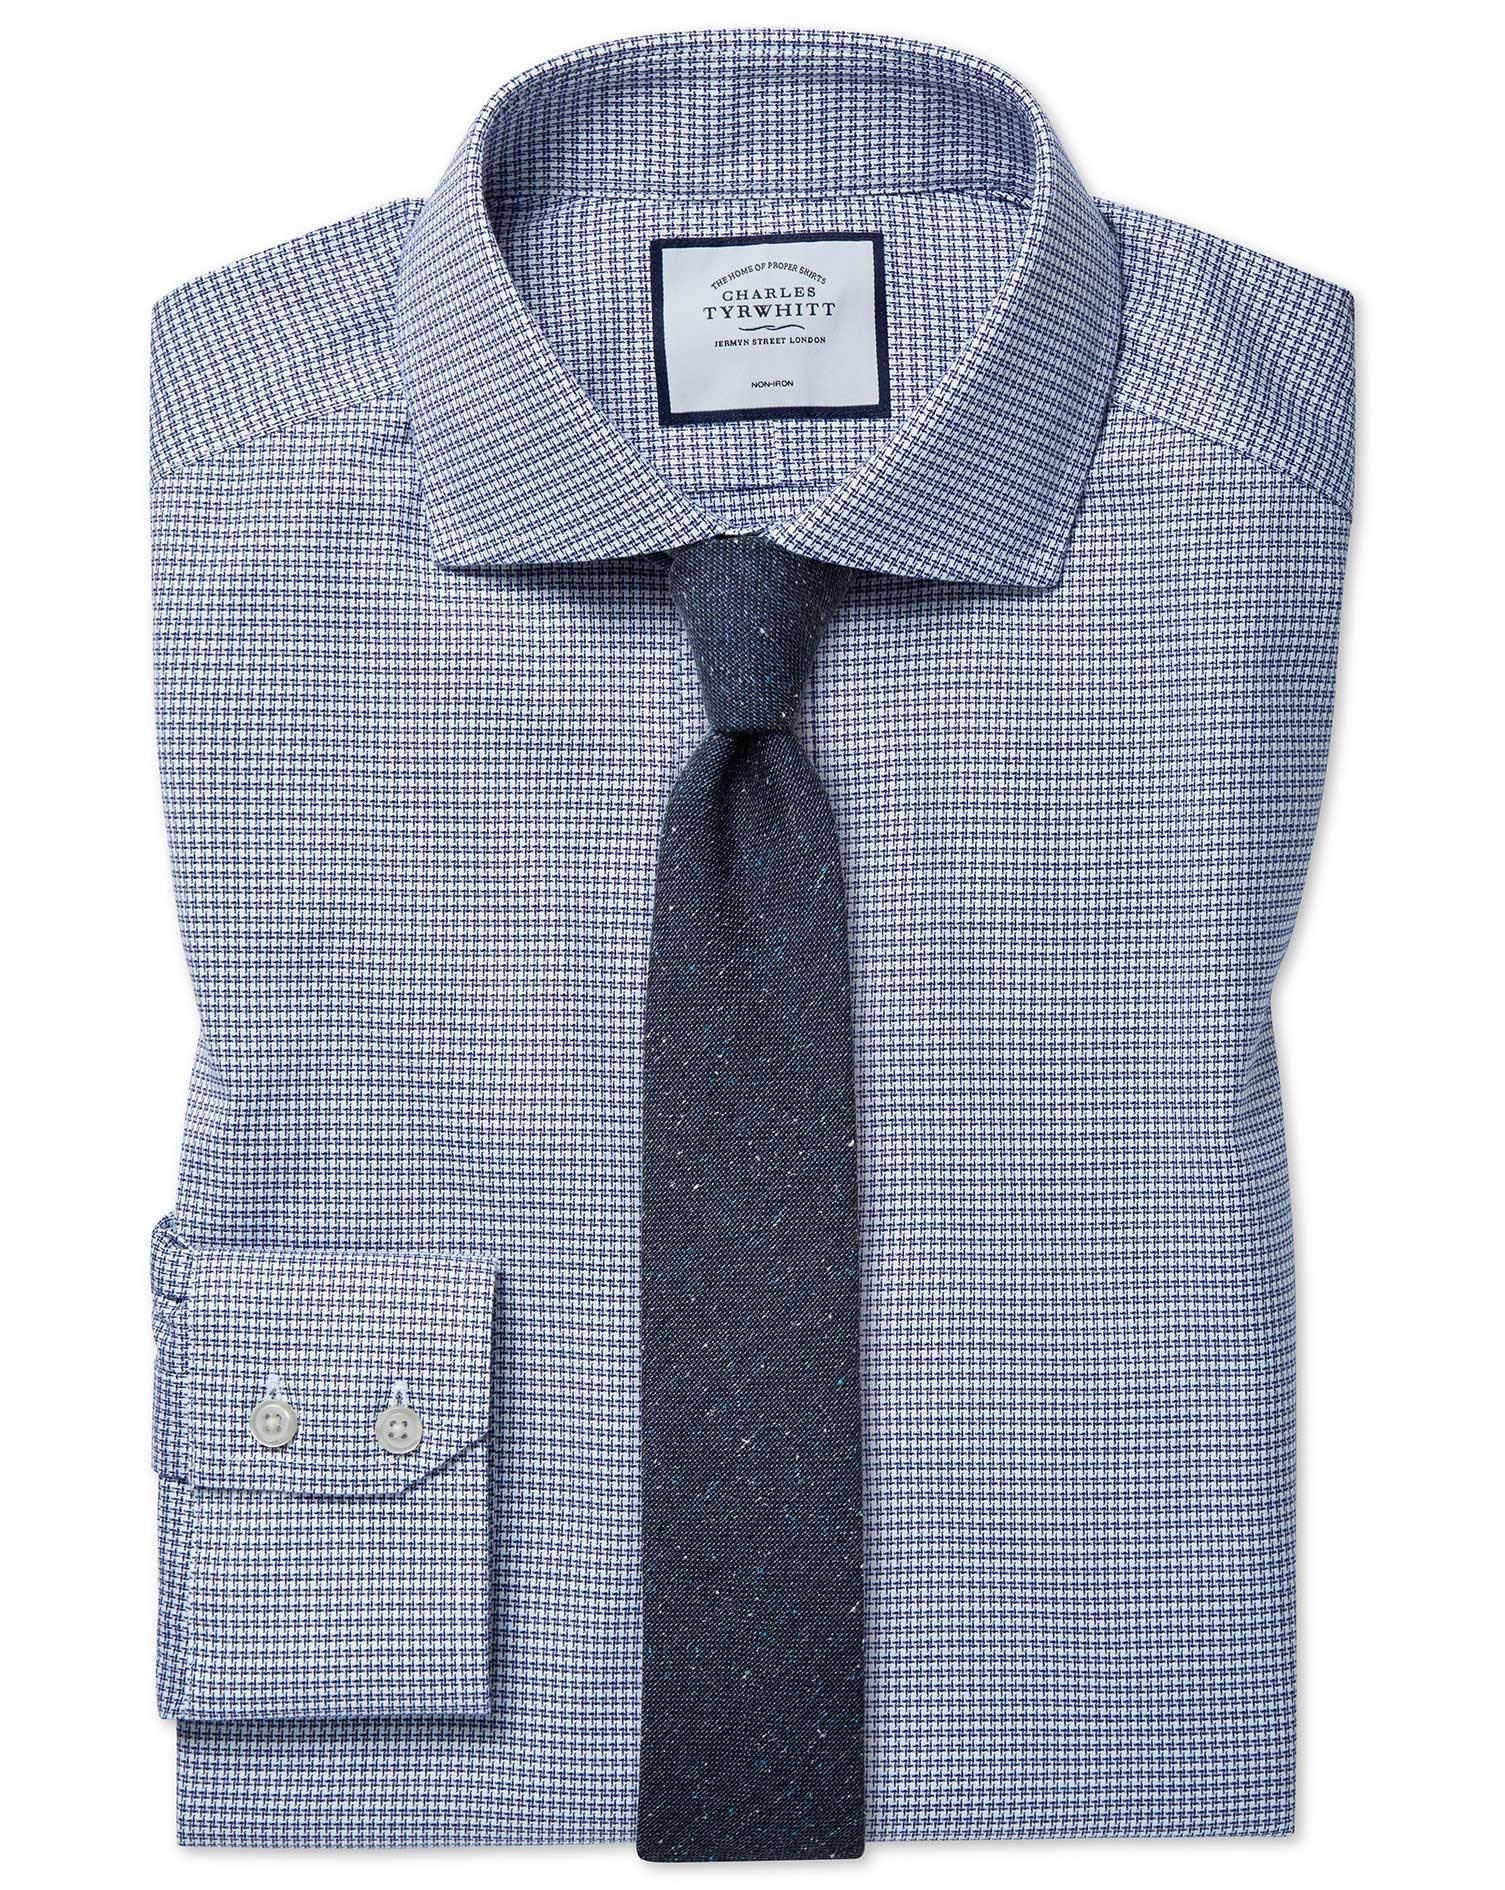 Extra Slim Fit Cutaway Non-Iron Cotton Stretch Navy Shirt